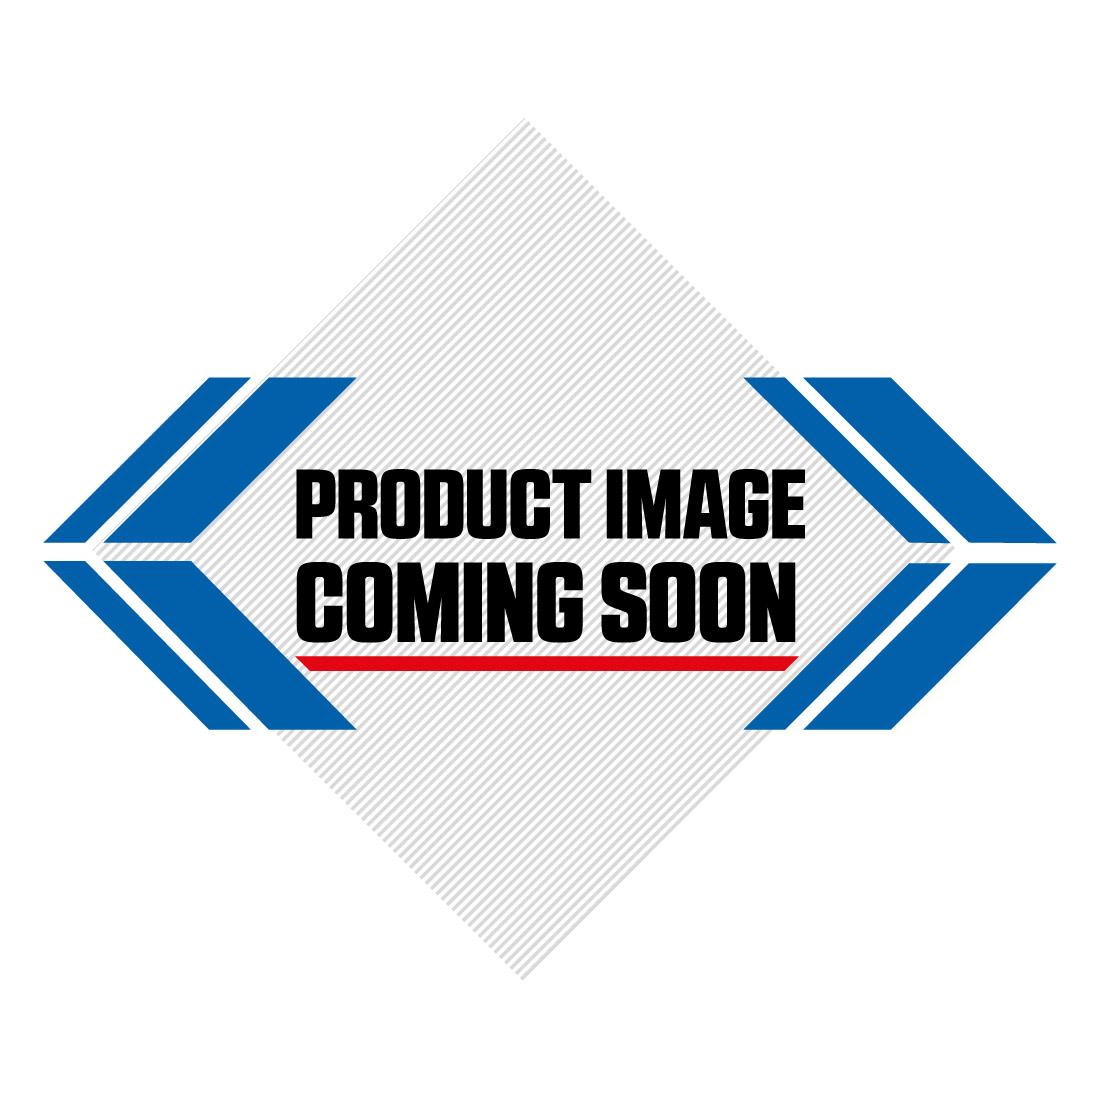 Suzuki Plastic Kit  RM 125 250 (99-00) Black Image-5>